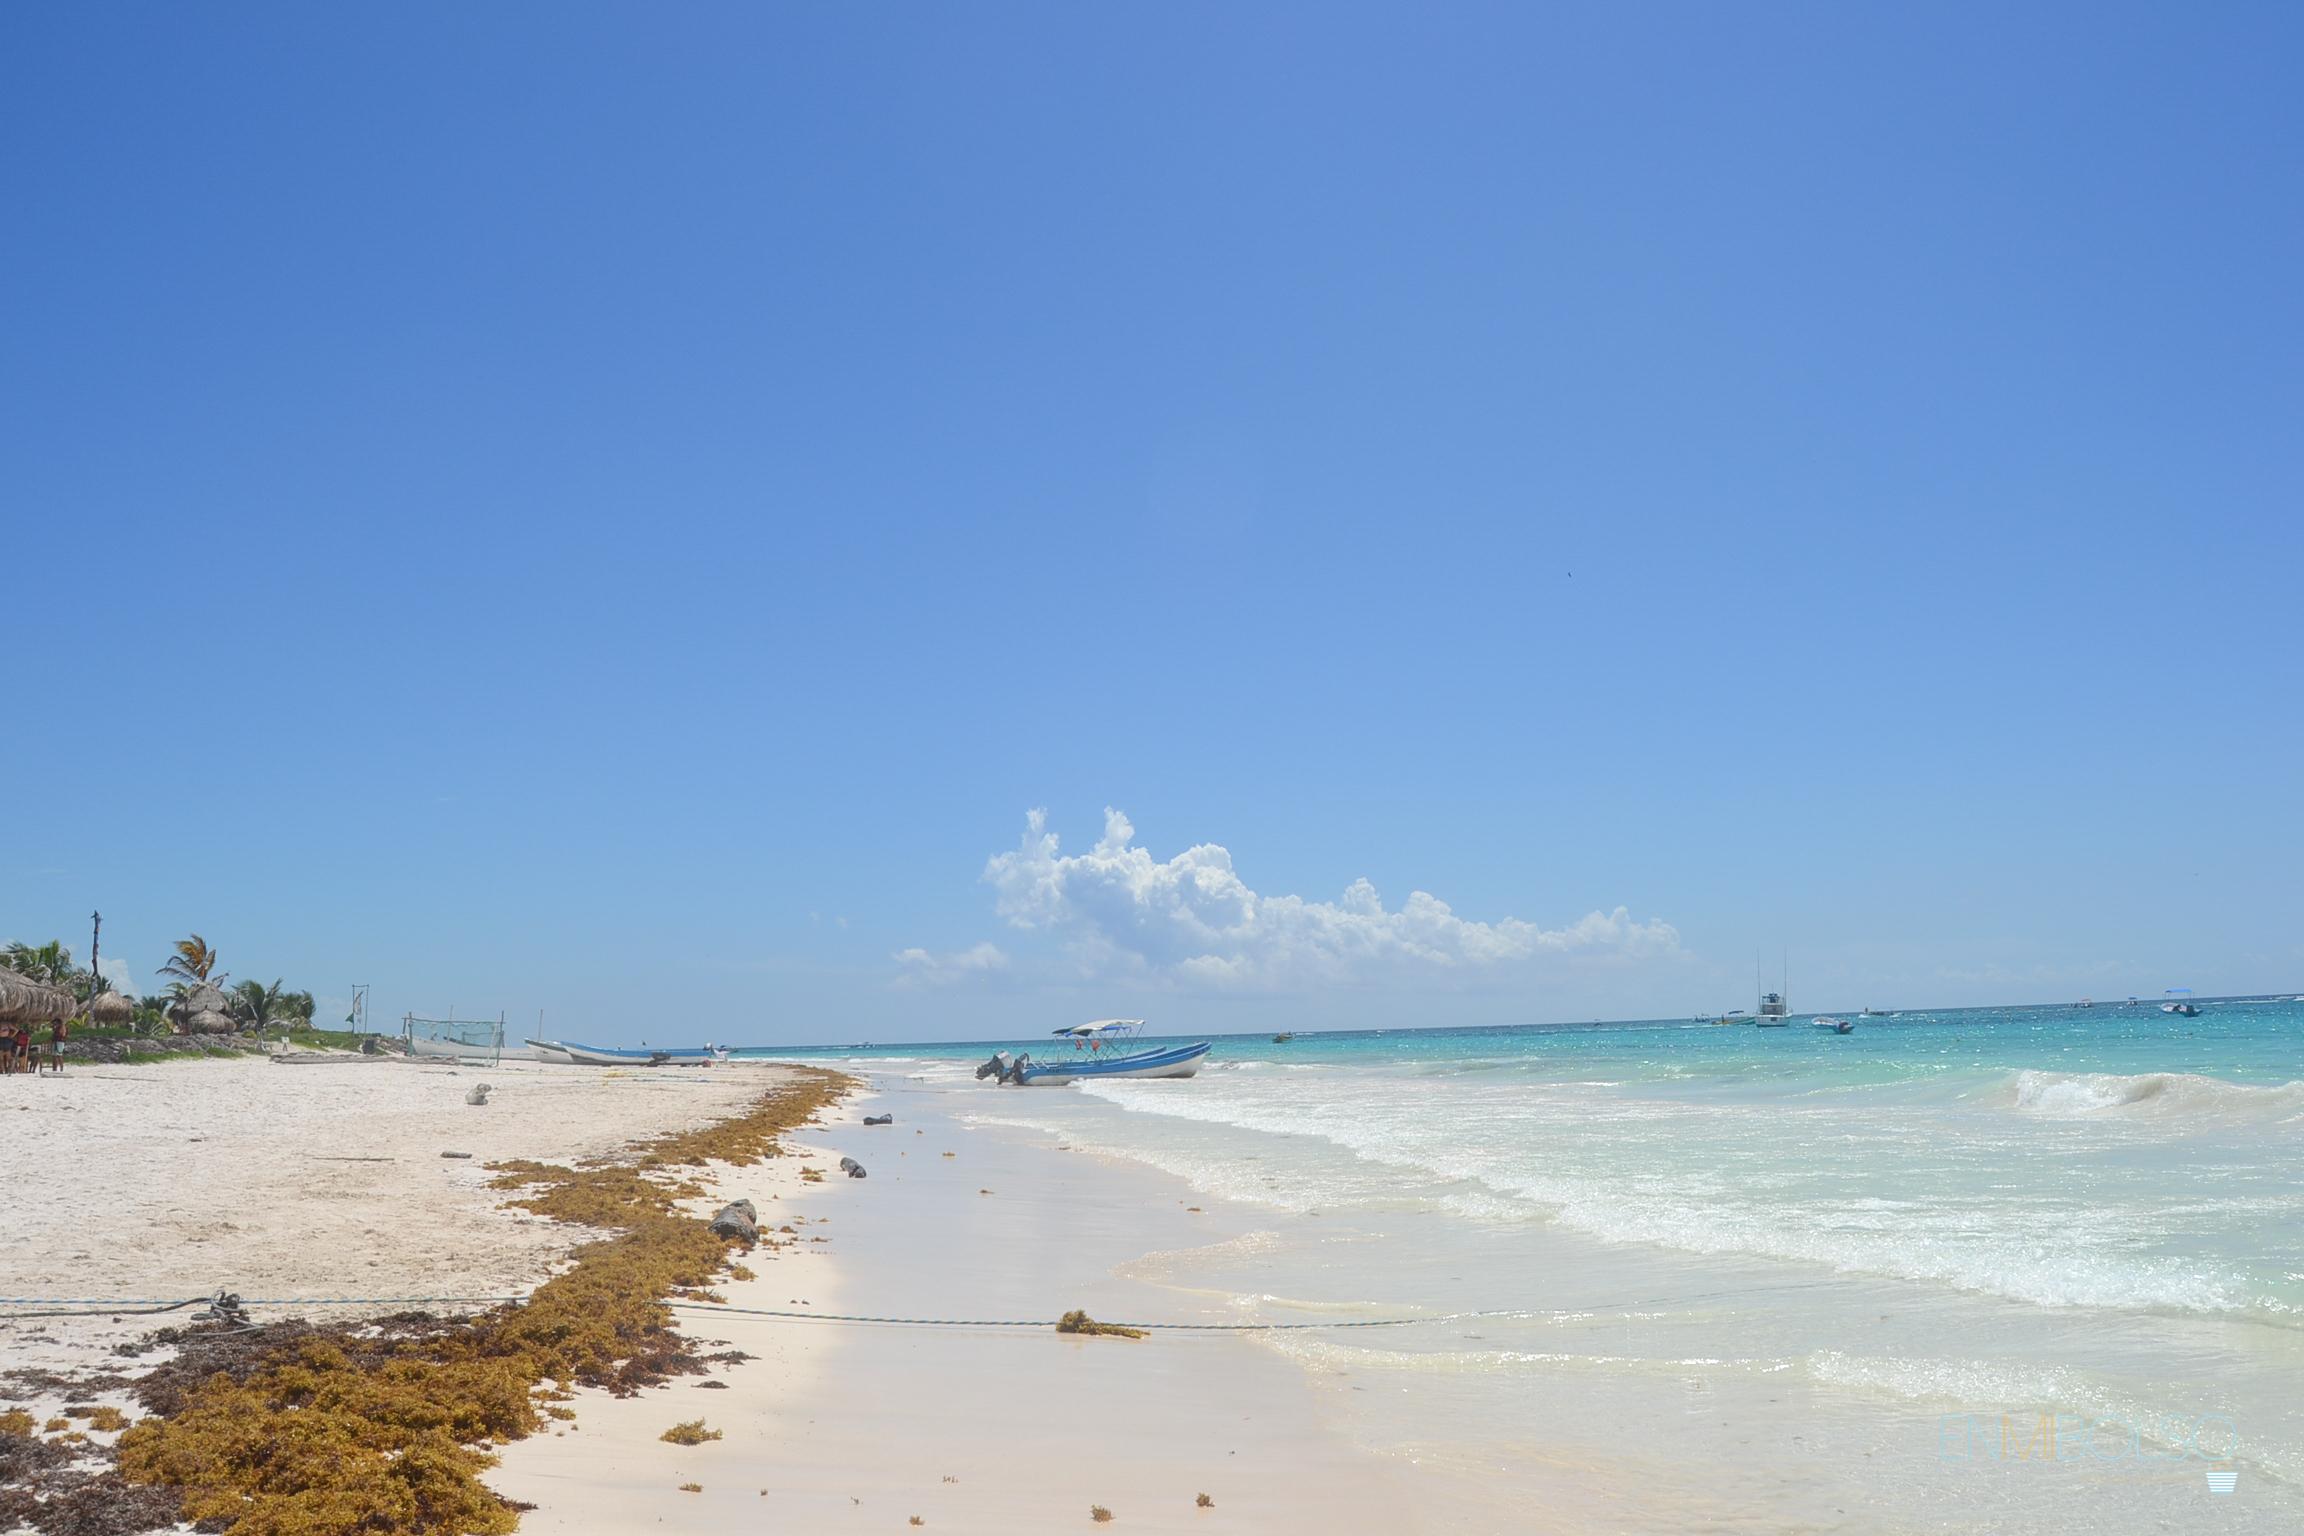 Tulum-Playa Paraiso vistas-enmibolso